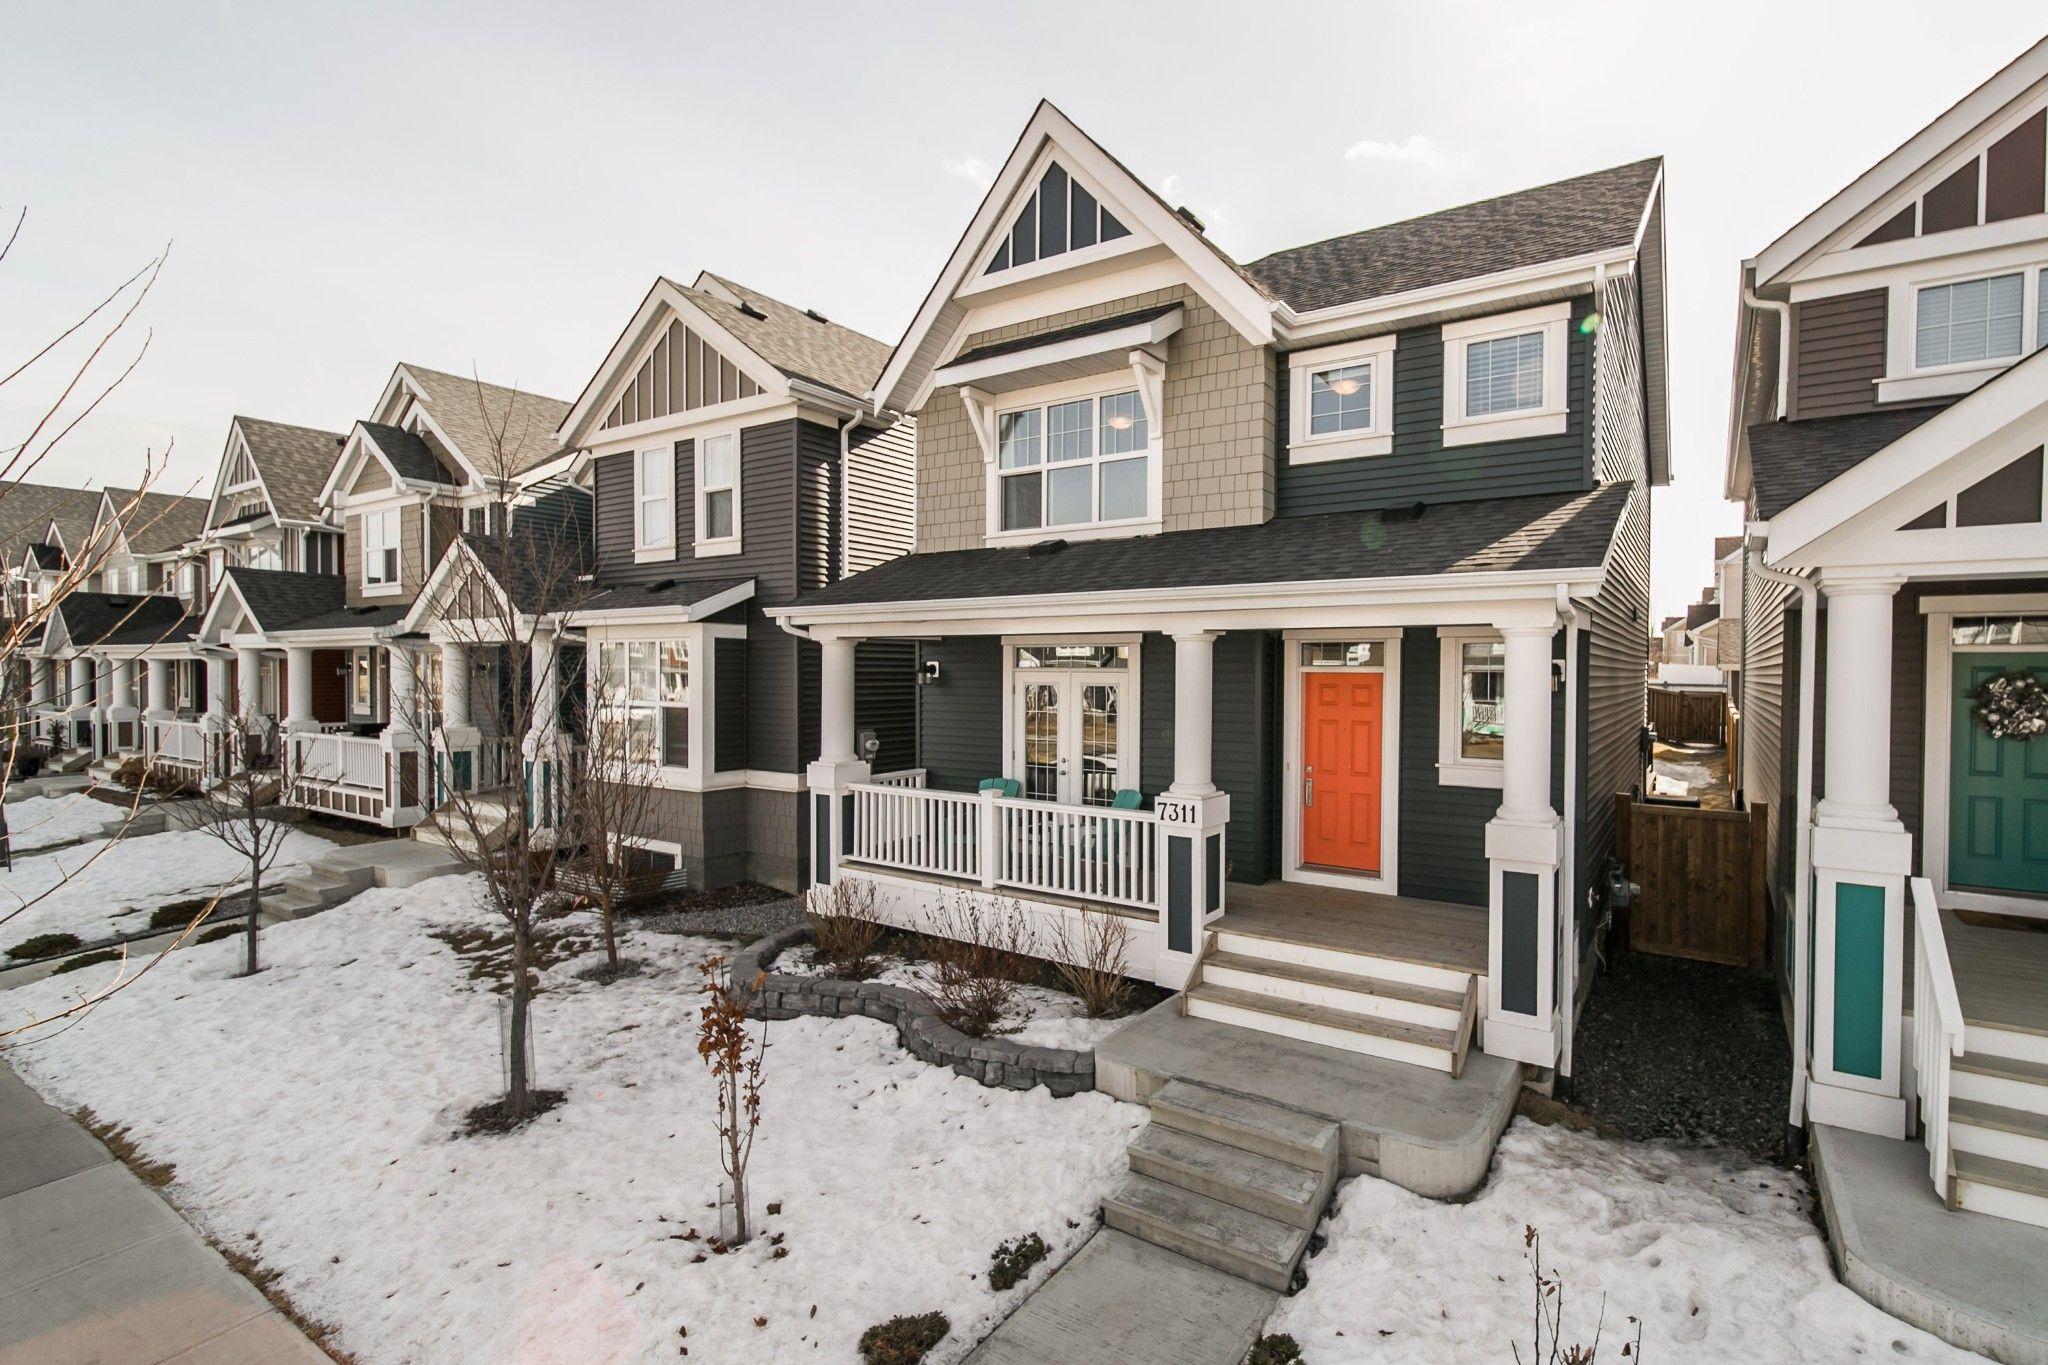 Main Photo: 7311 Summerside Grande Boulevard Boulevard in Edmonton: House for sale : MLS®# E4234512